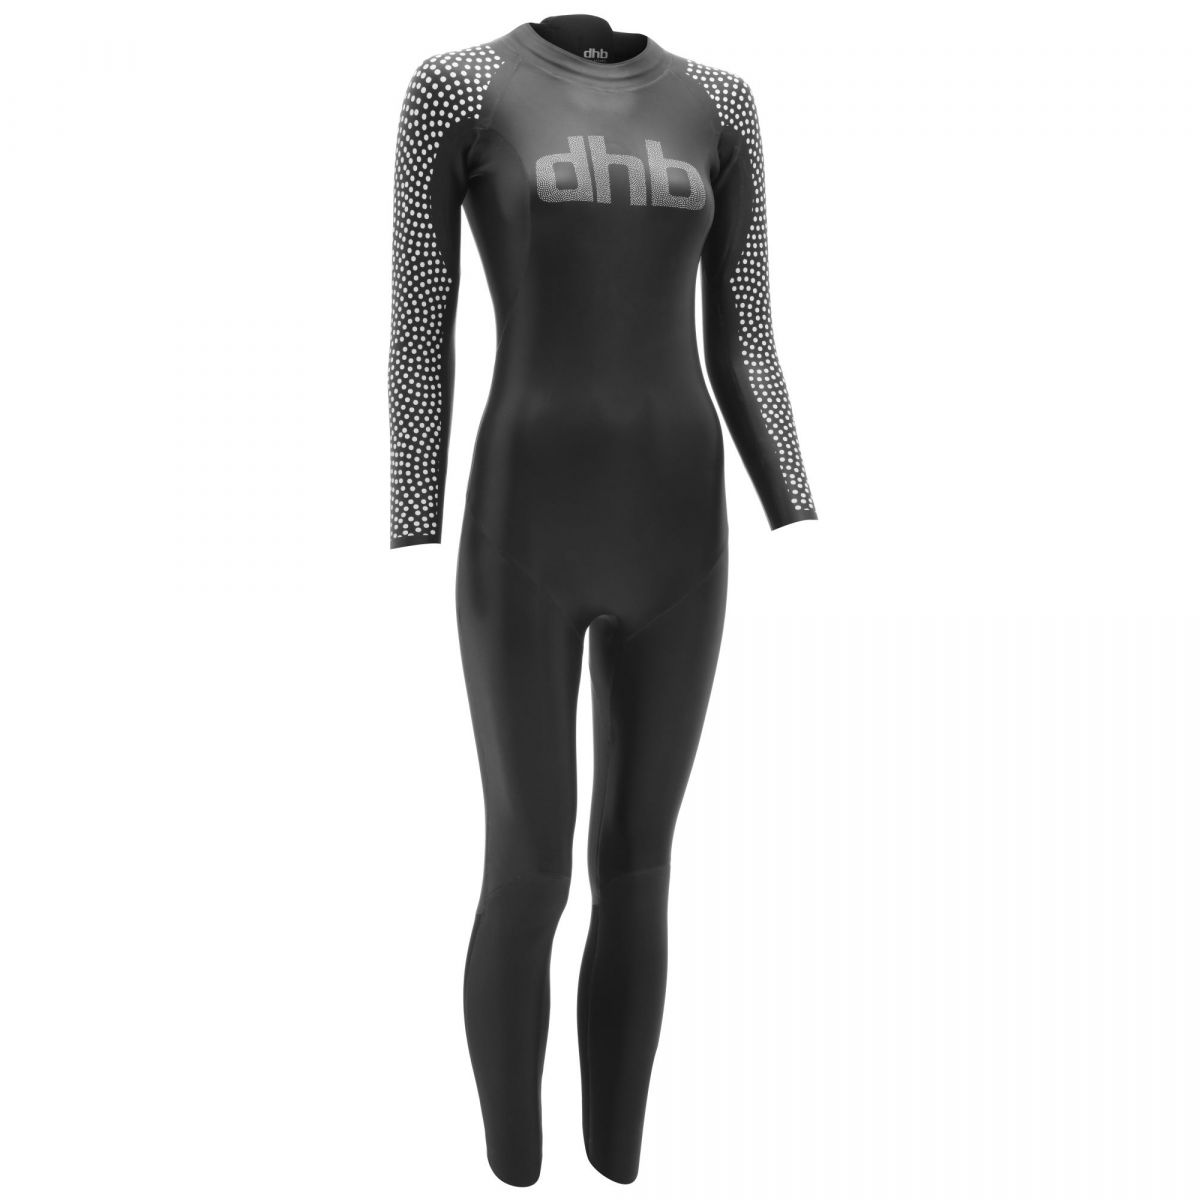 dhb-Moda-Wetsuit-women-front